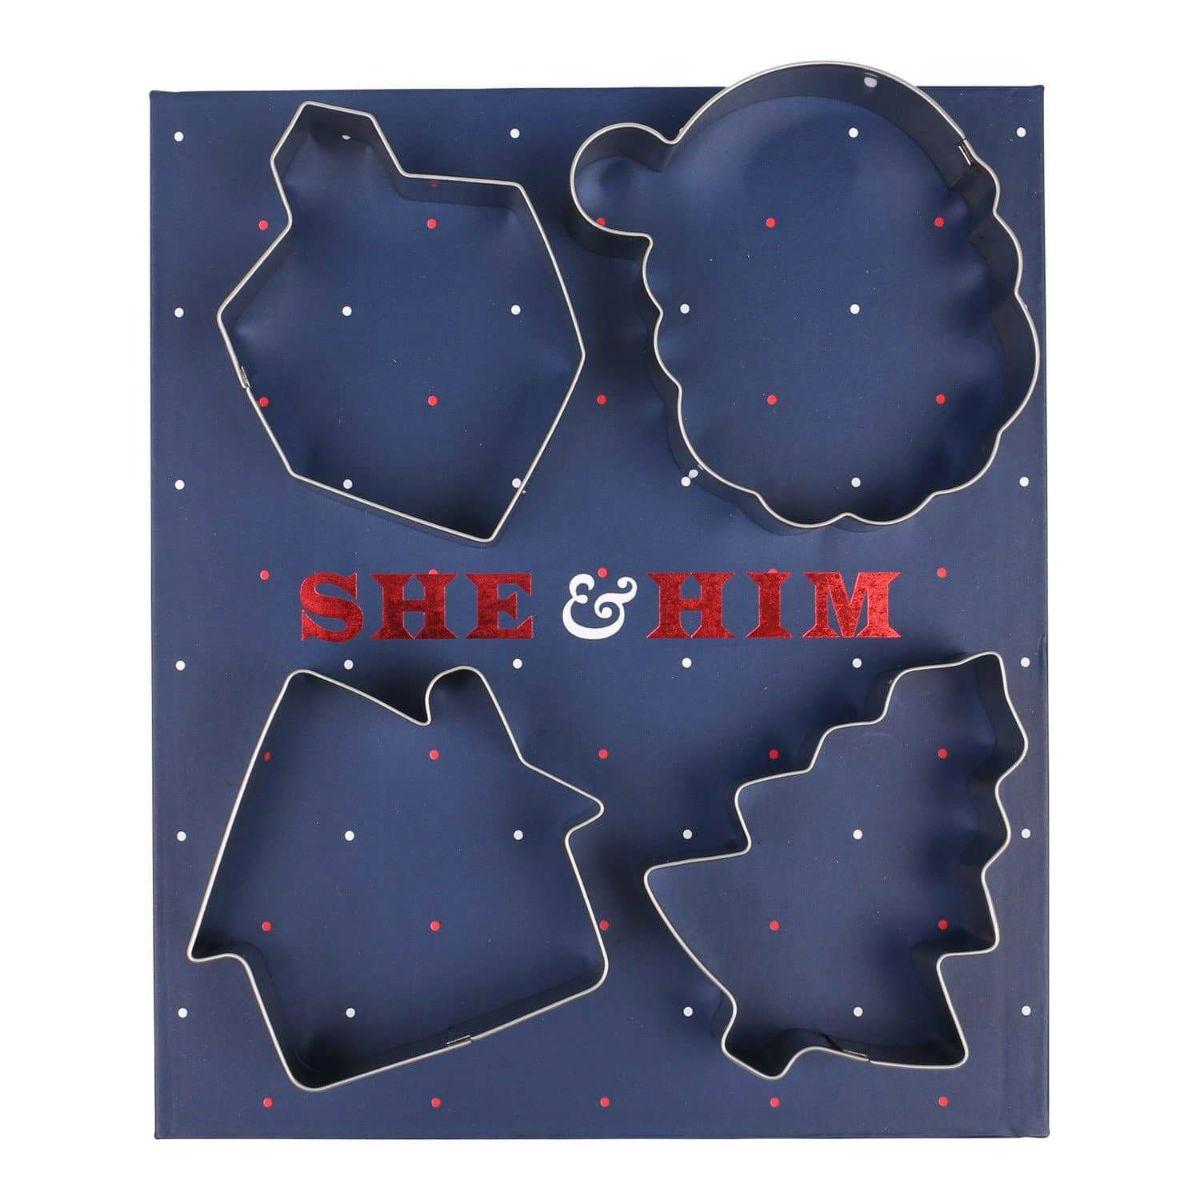 She & Him 4-Piece Cookie Cutter Set